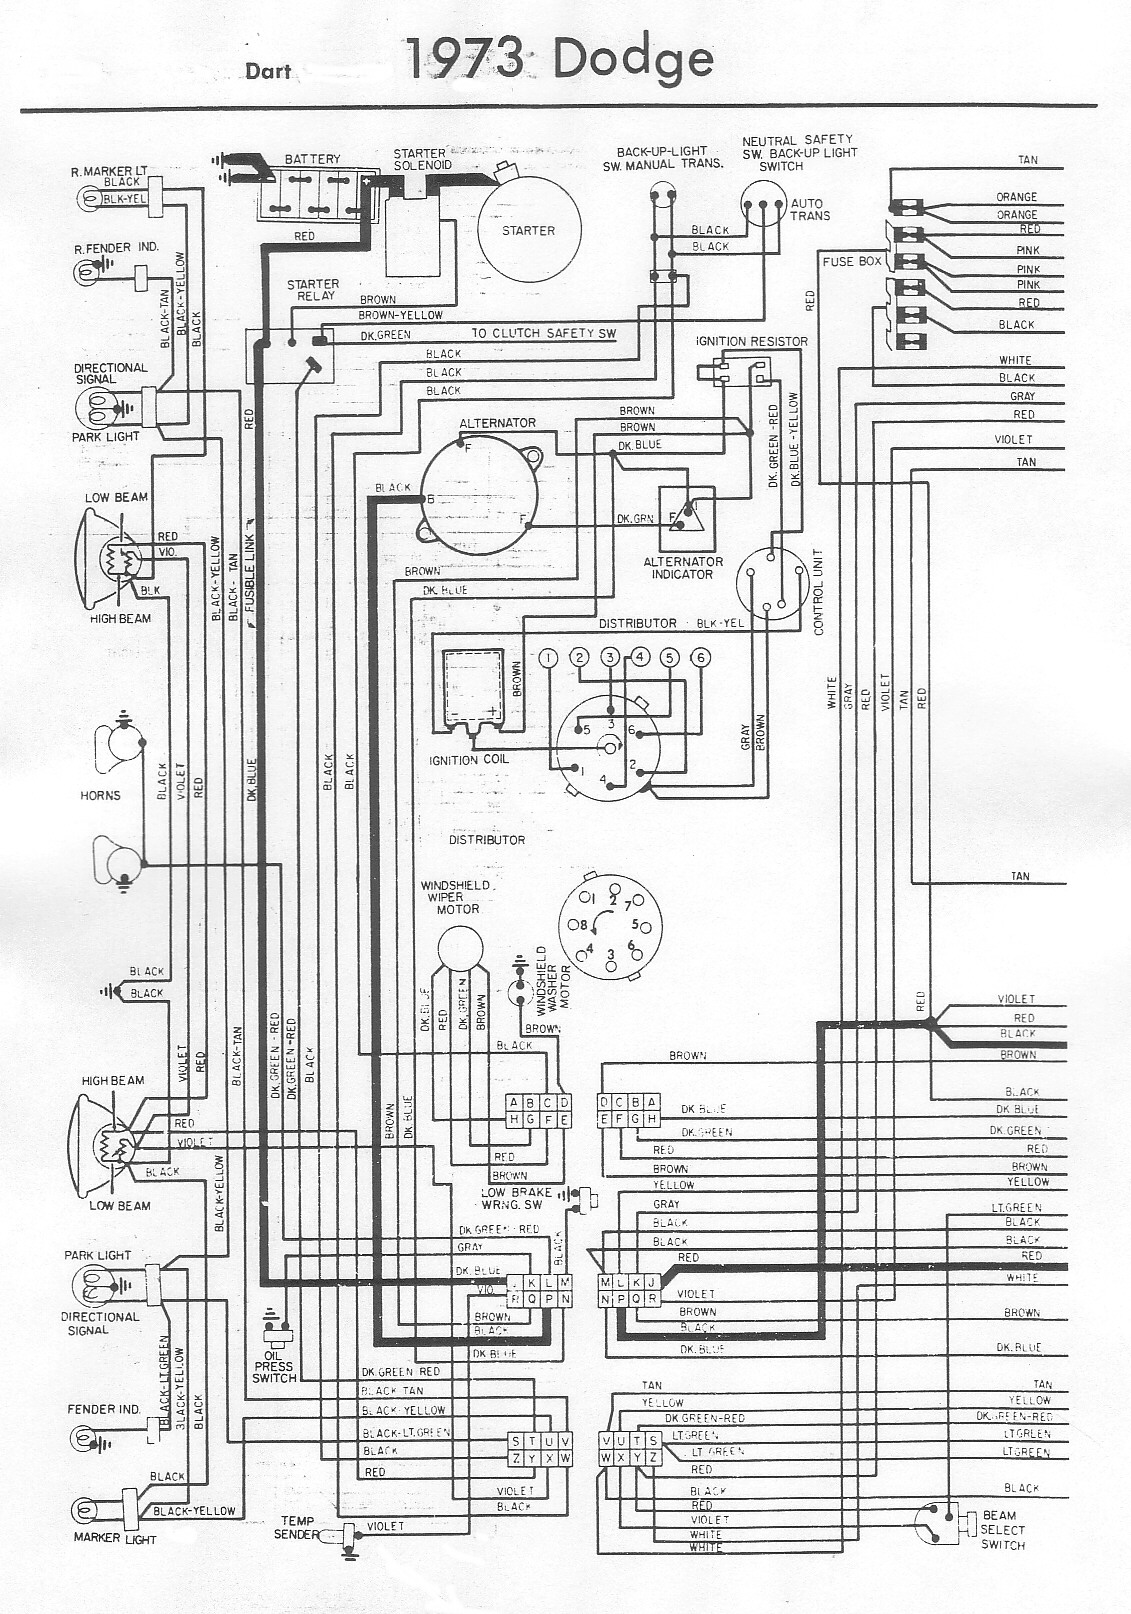 medium resolution of 73 dodge dart wiring diagram wiring diagrams data 1973 dodge dart engine wiring harness 1973 dodge dart wiring harness